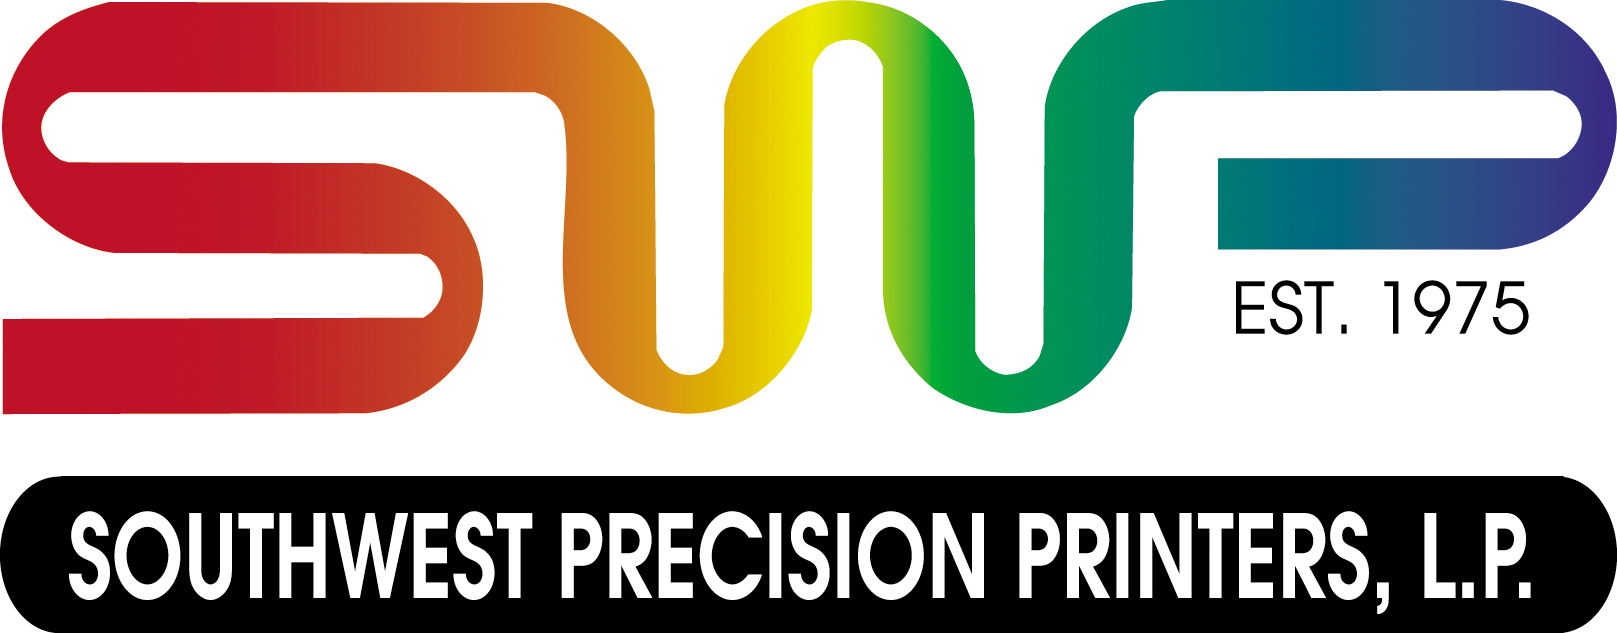 Southwest Precision Printers